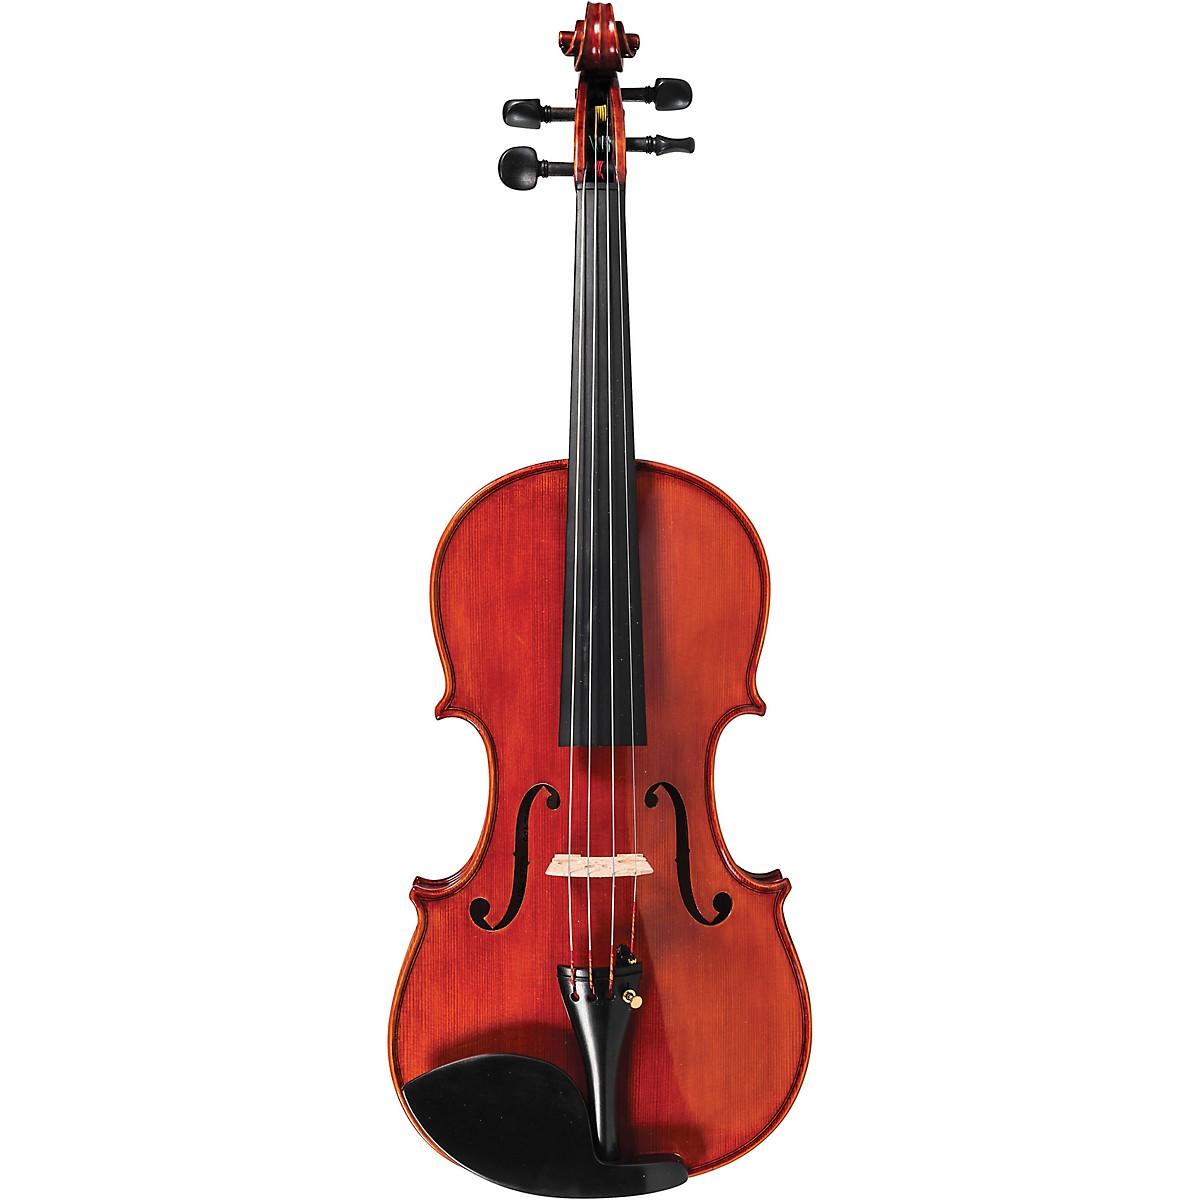 STROBEL ML-405 Recital Series Violin Outfit